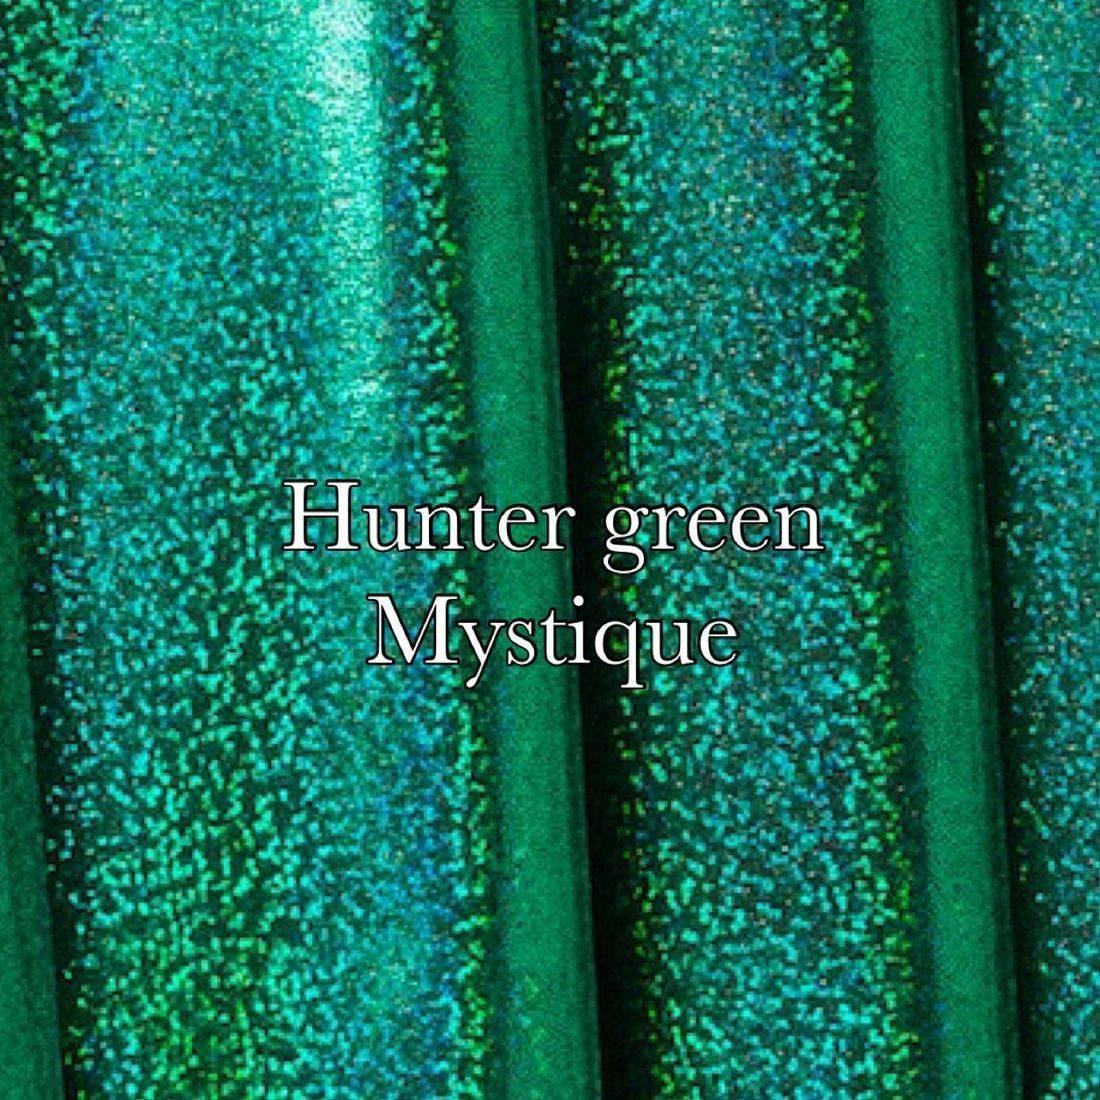 Emerald black holographic mist